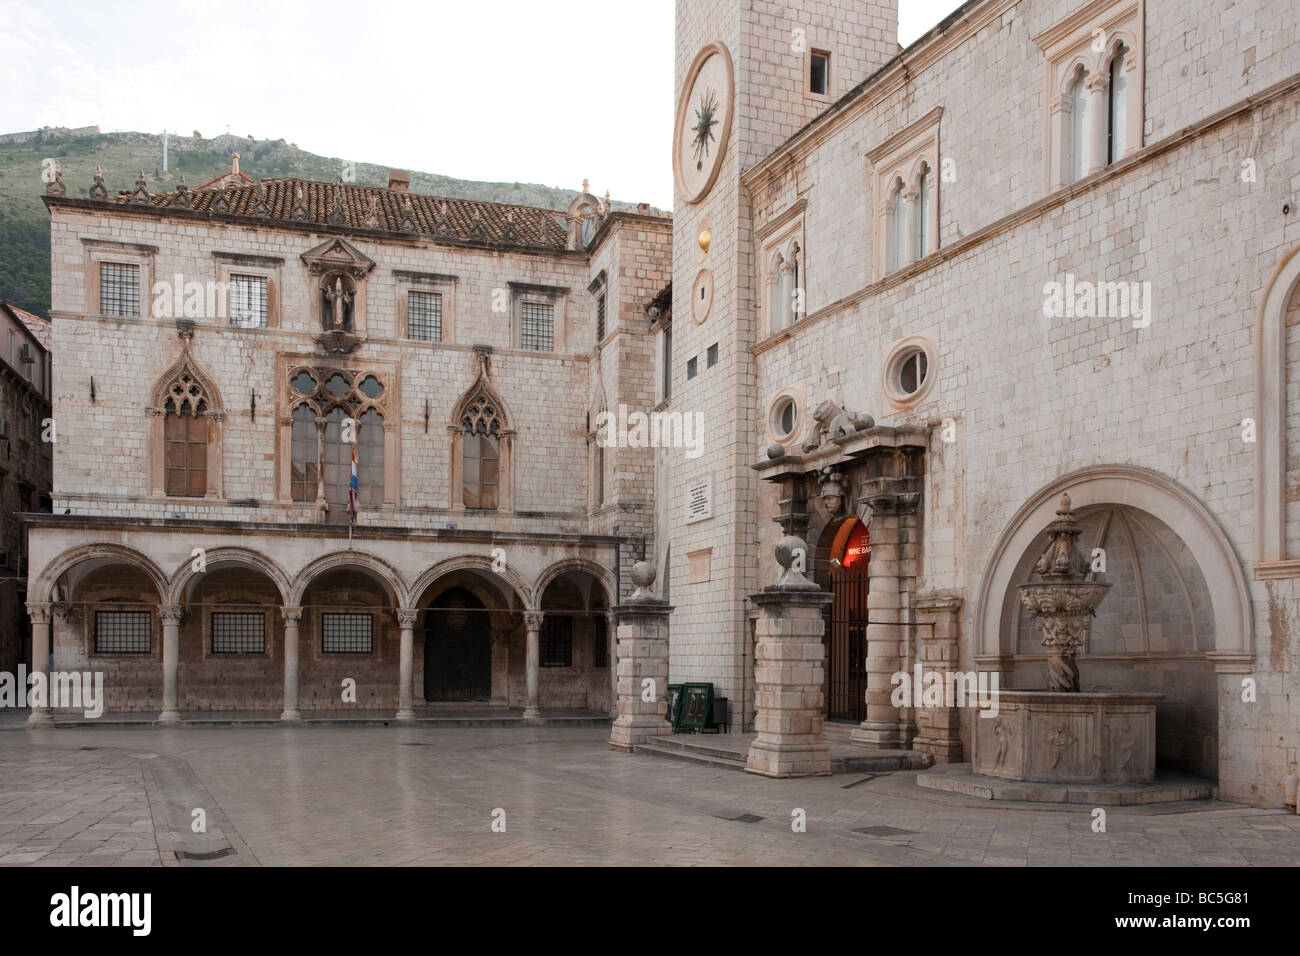 Sponza Palace and Square of the Loggia, Dubrovnik, Croatia - Stock Image